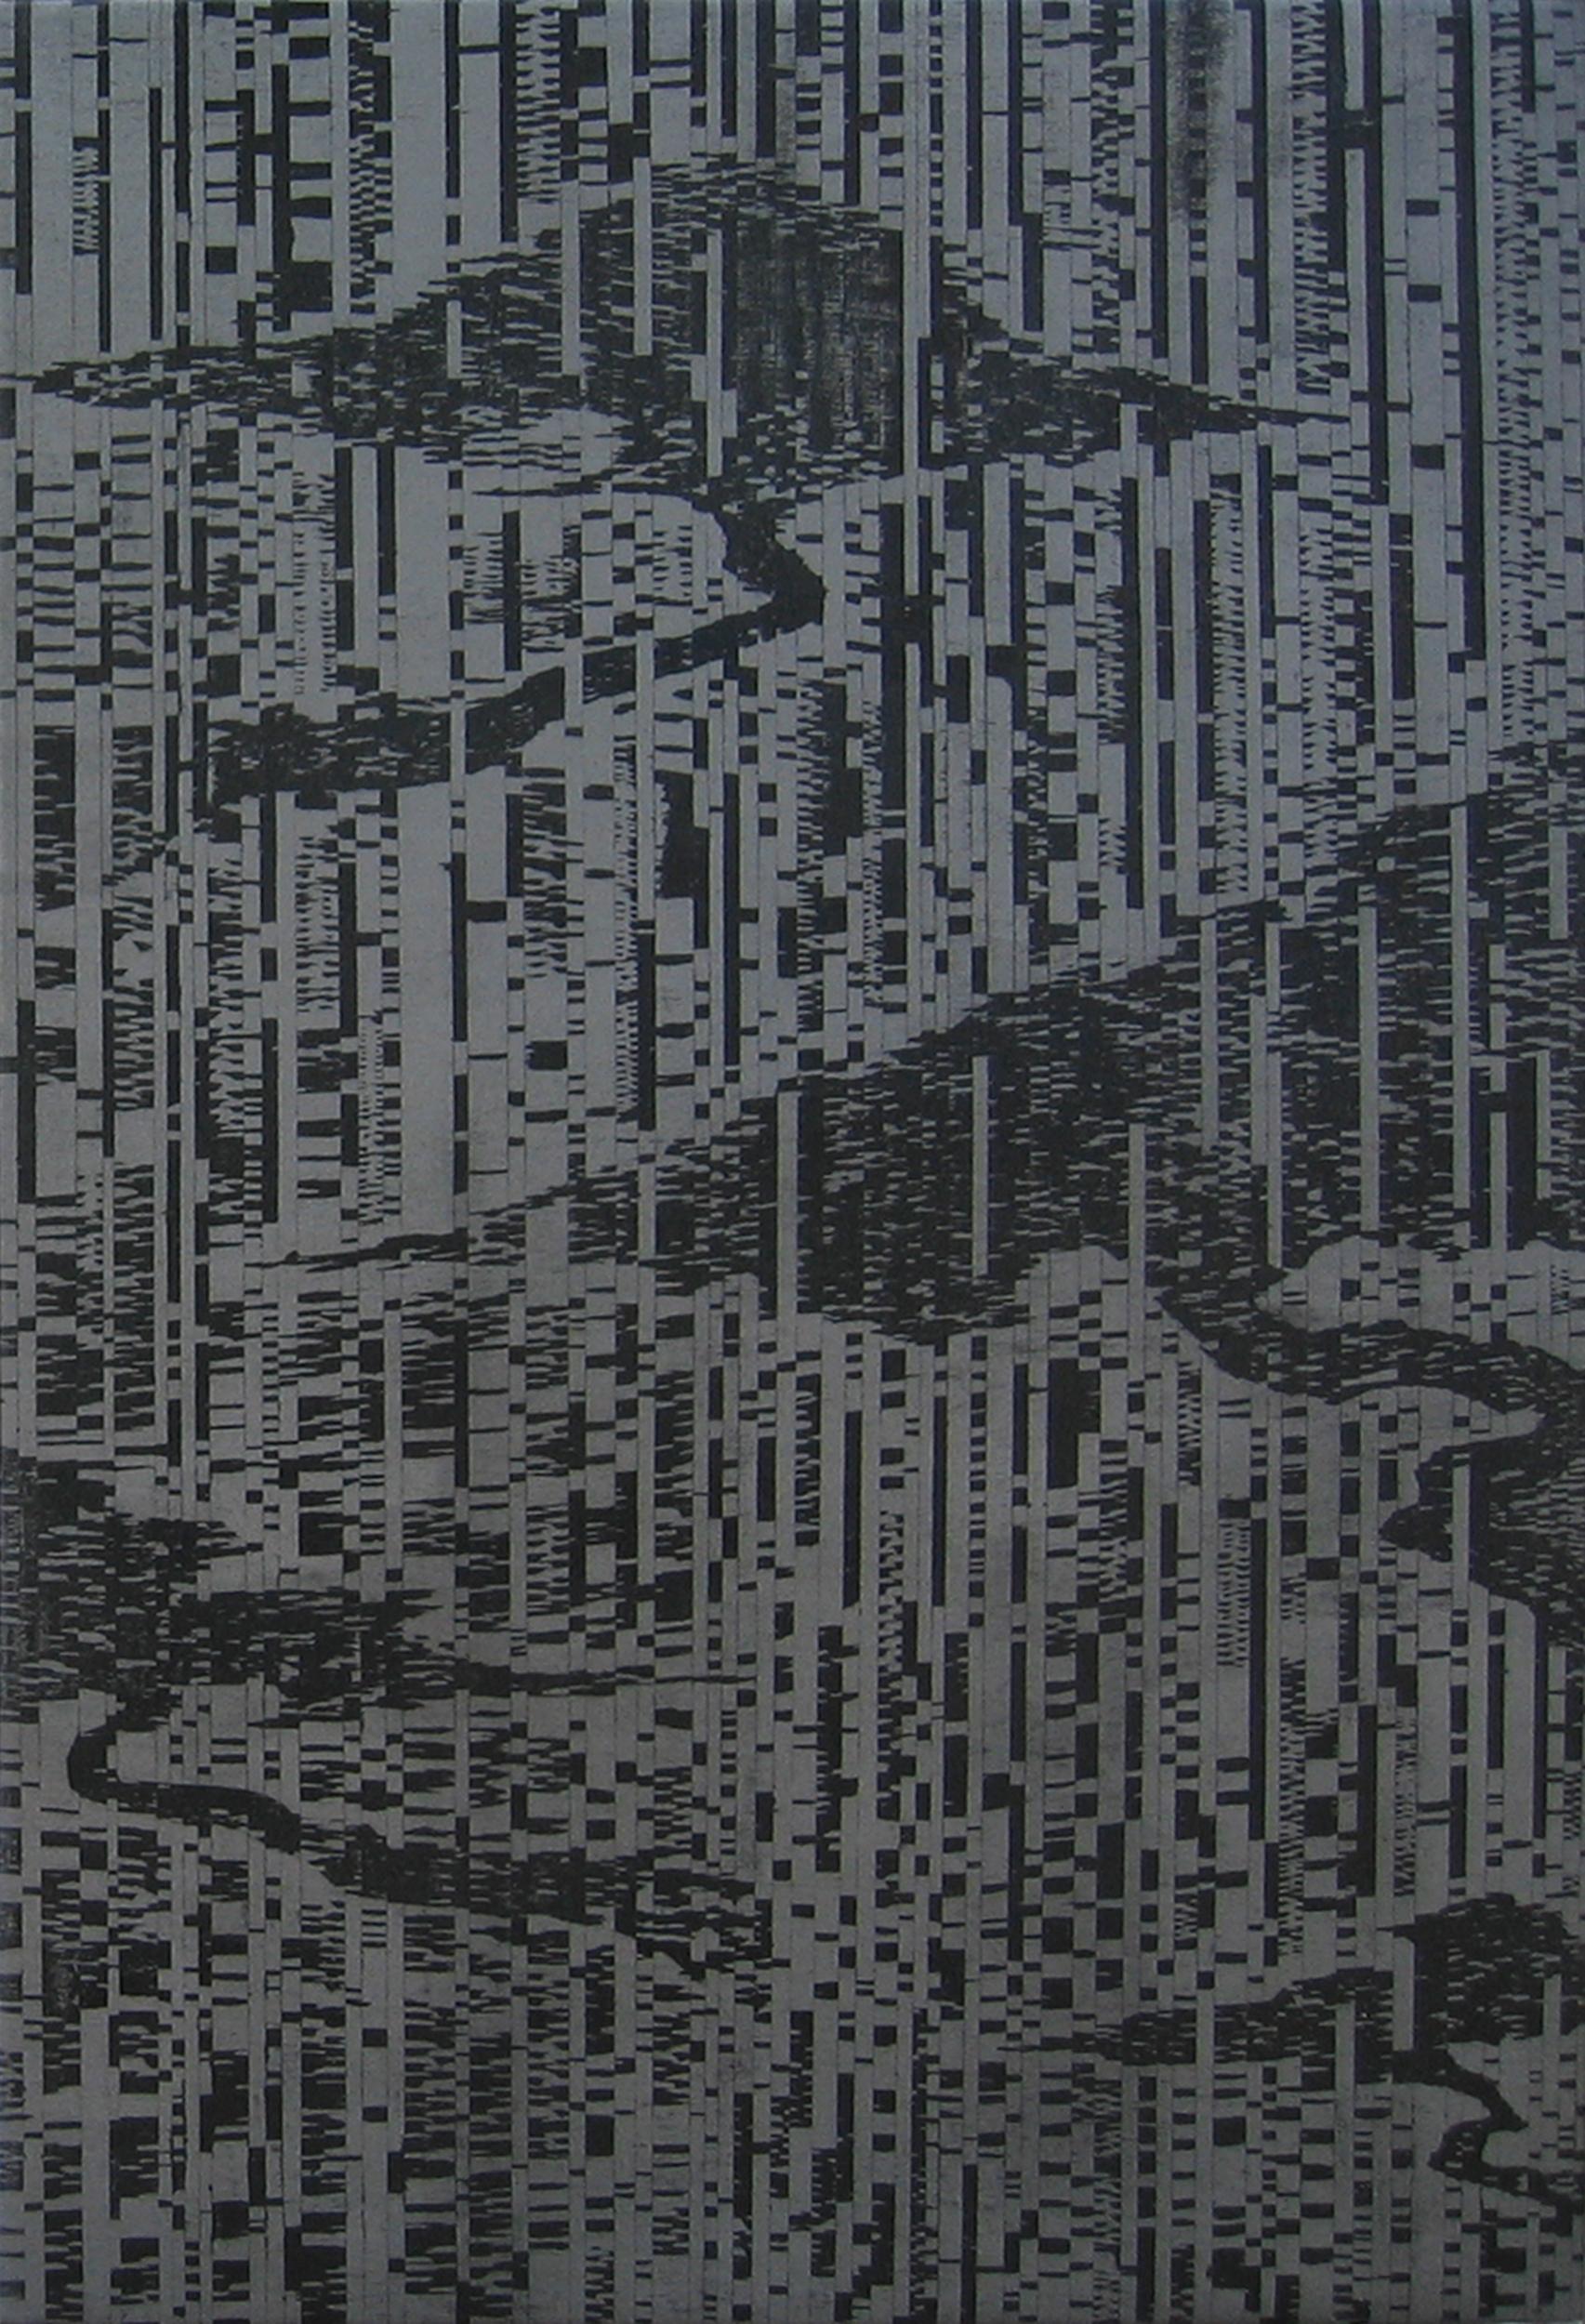 reform-or-ruin-panel-3-of-4-by-matthew-bindert-2006_5346777670_o.jpg